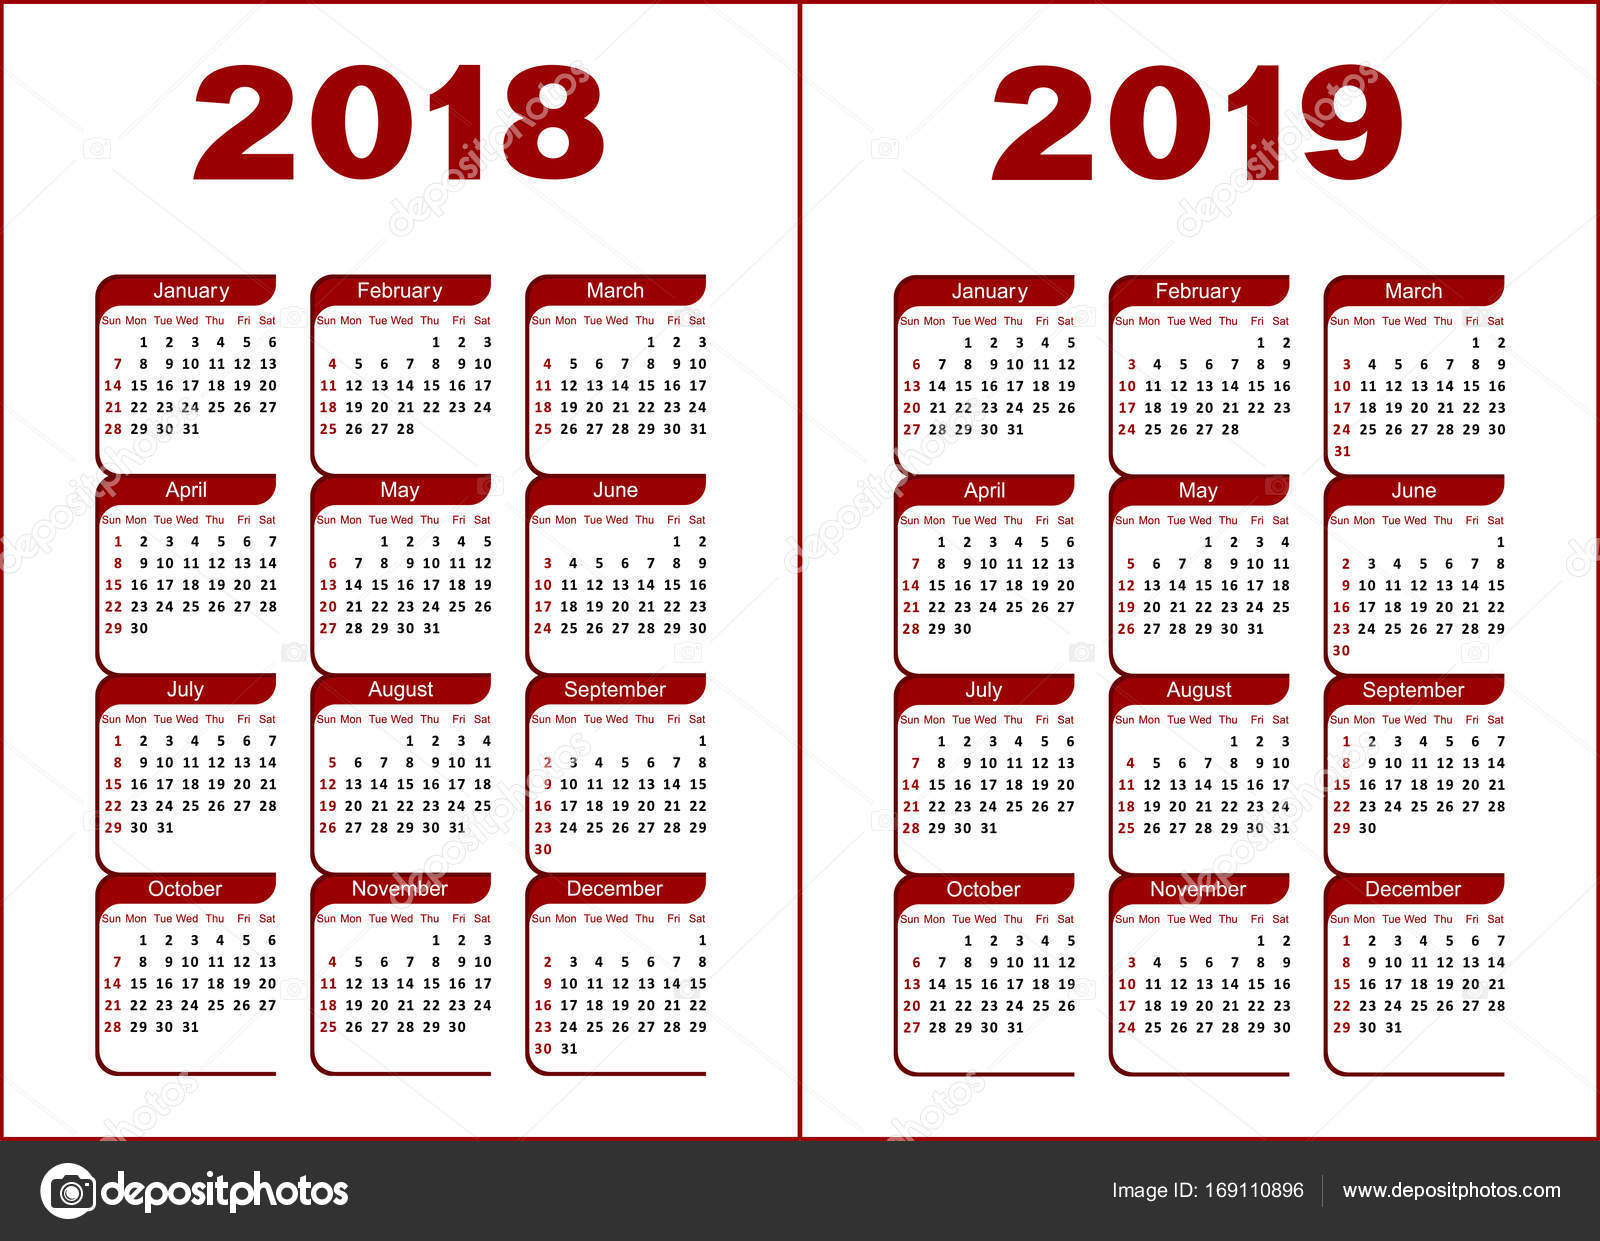 Calendar Illustration Questions : Calendario newcalendar